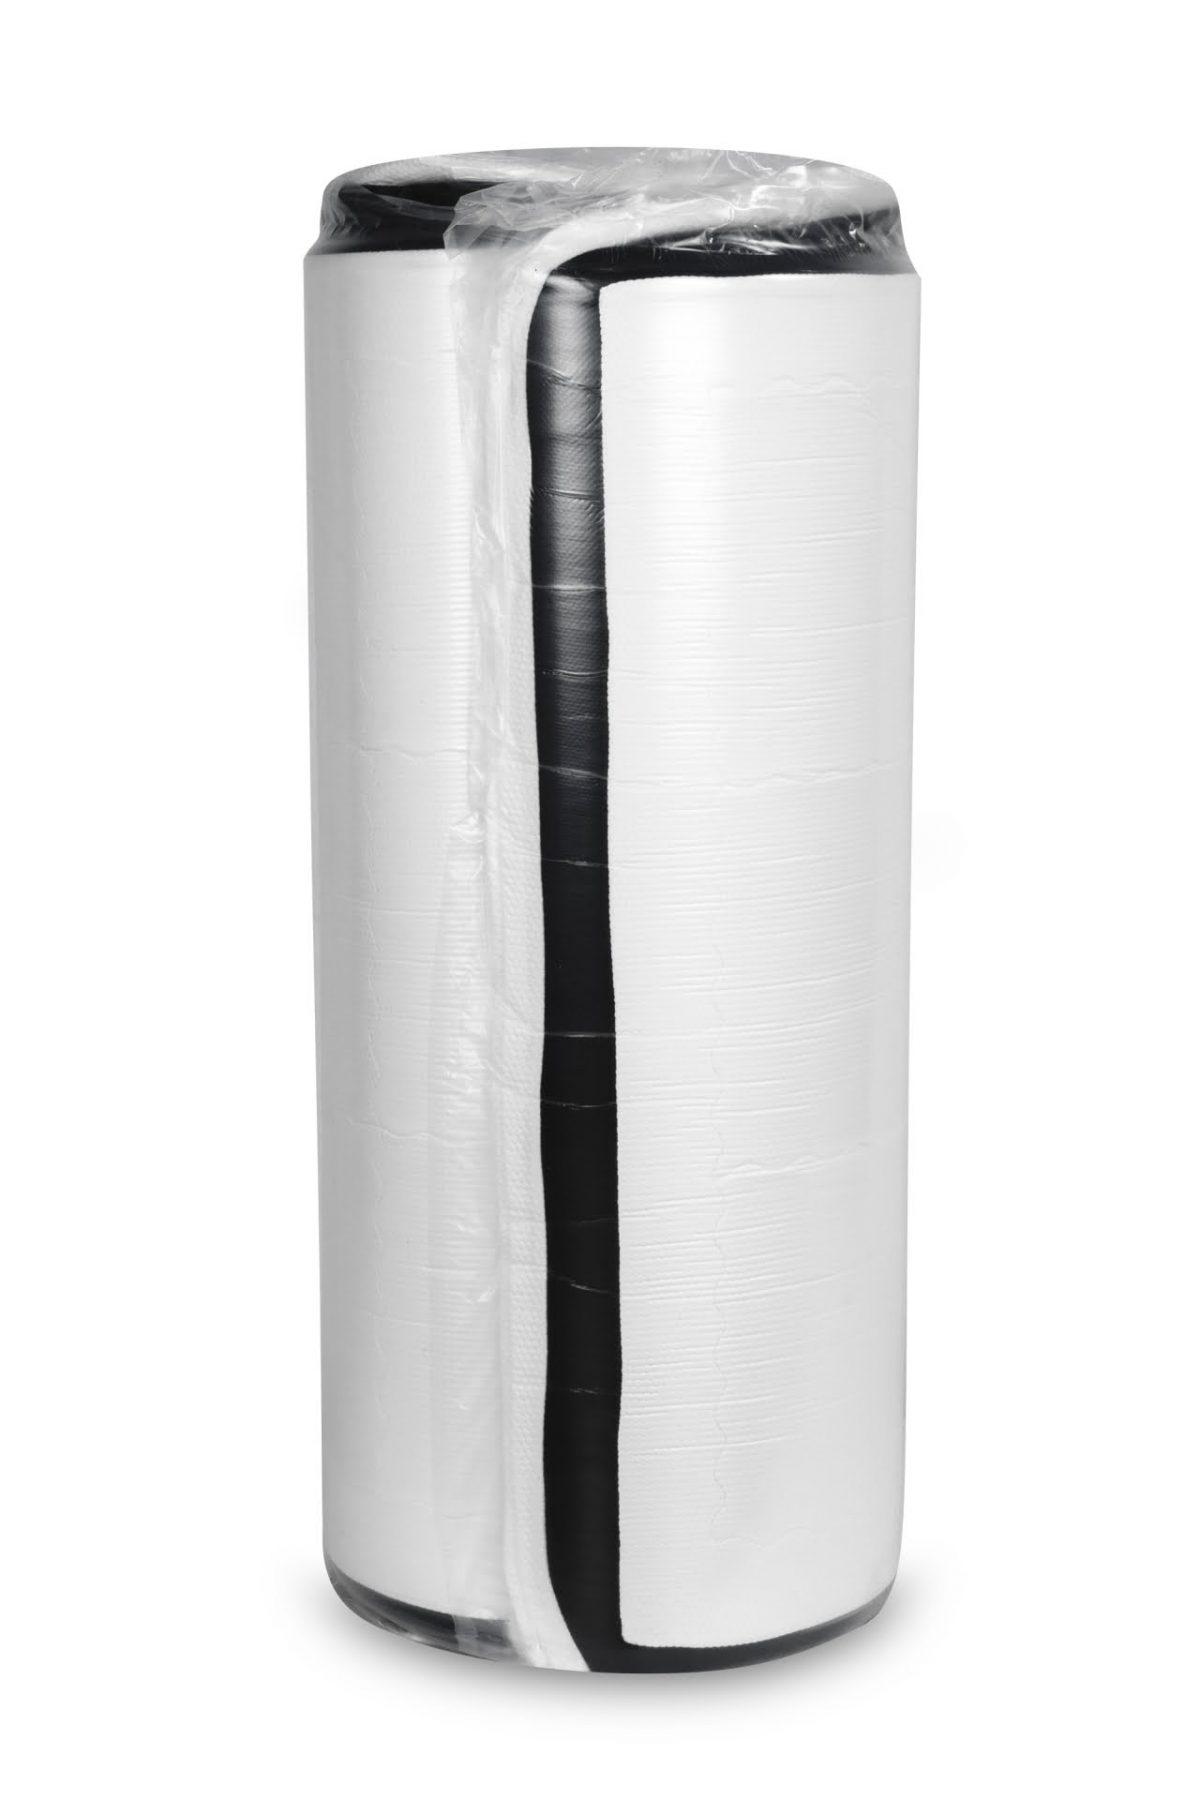 Saltea Multistraturi 160×200 Multilayer Supreme Confort Somnart, spuma poliuretanica cu memorie SmartFoam + AirFoam, grosime 22cm, husa matlasata cu extra-strat, 3D, manere, fermitate medie